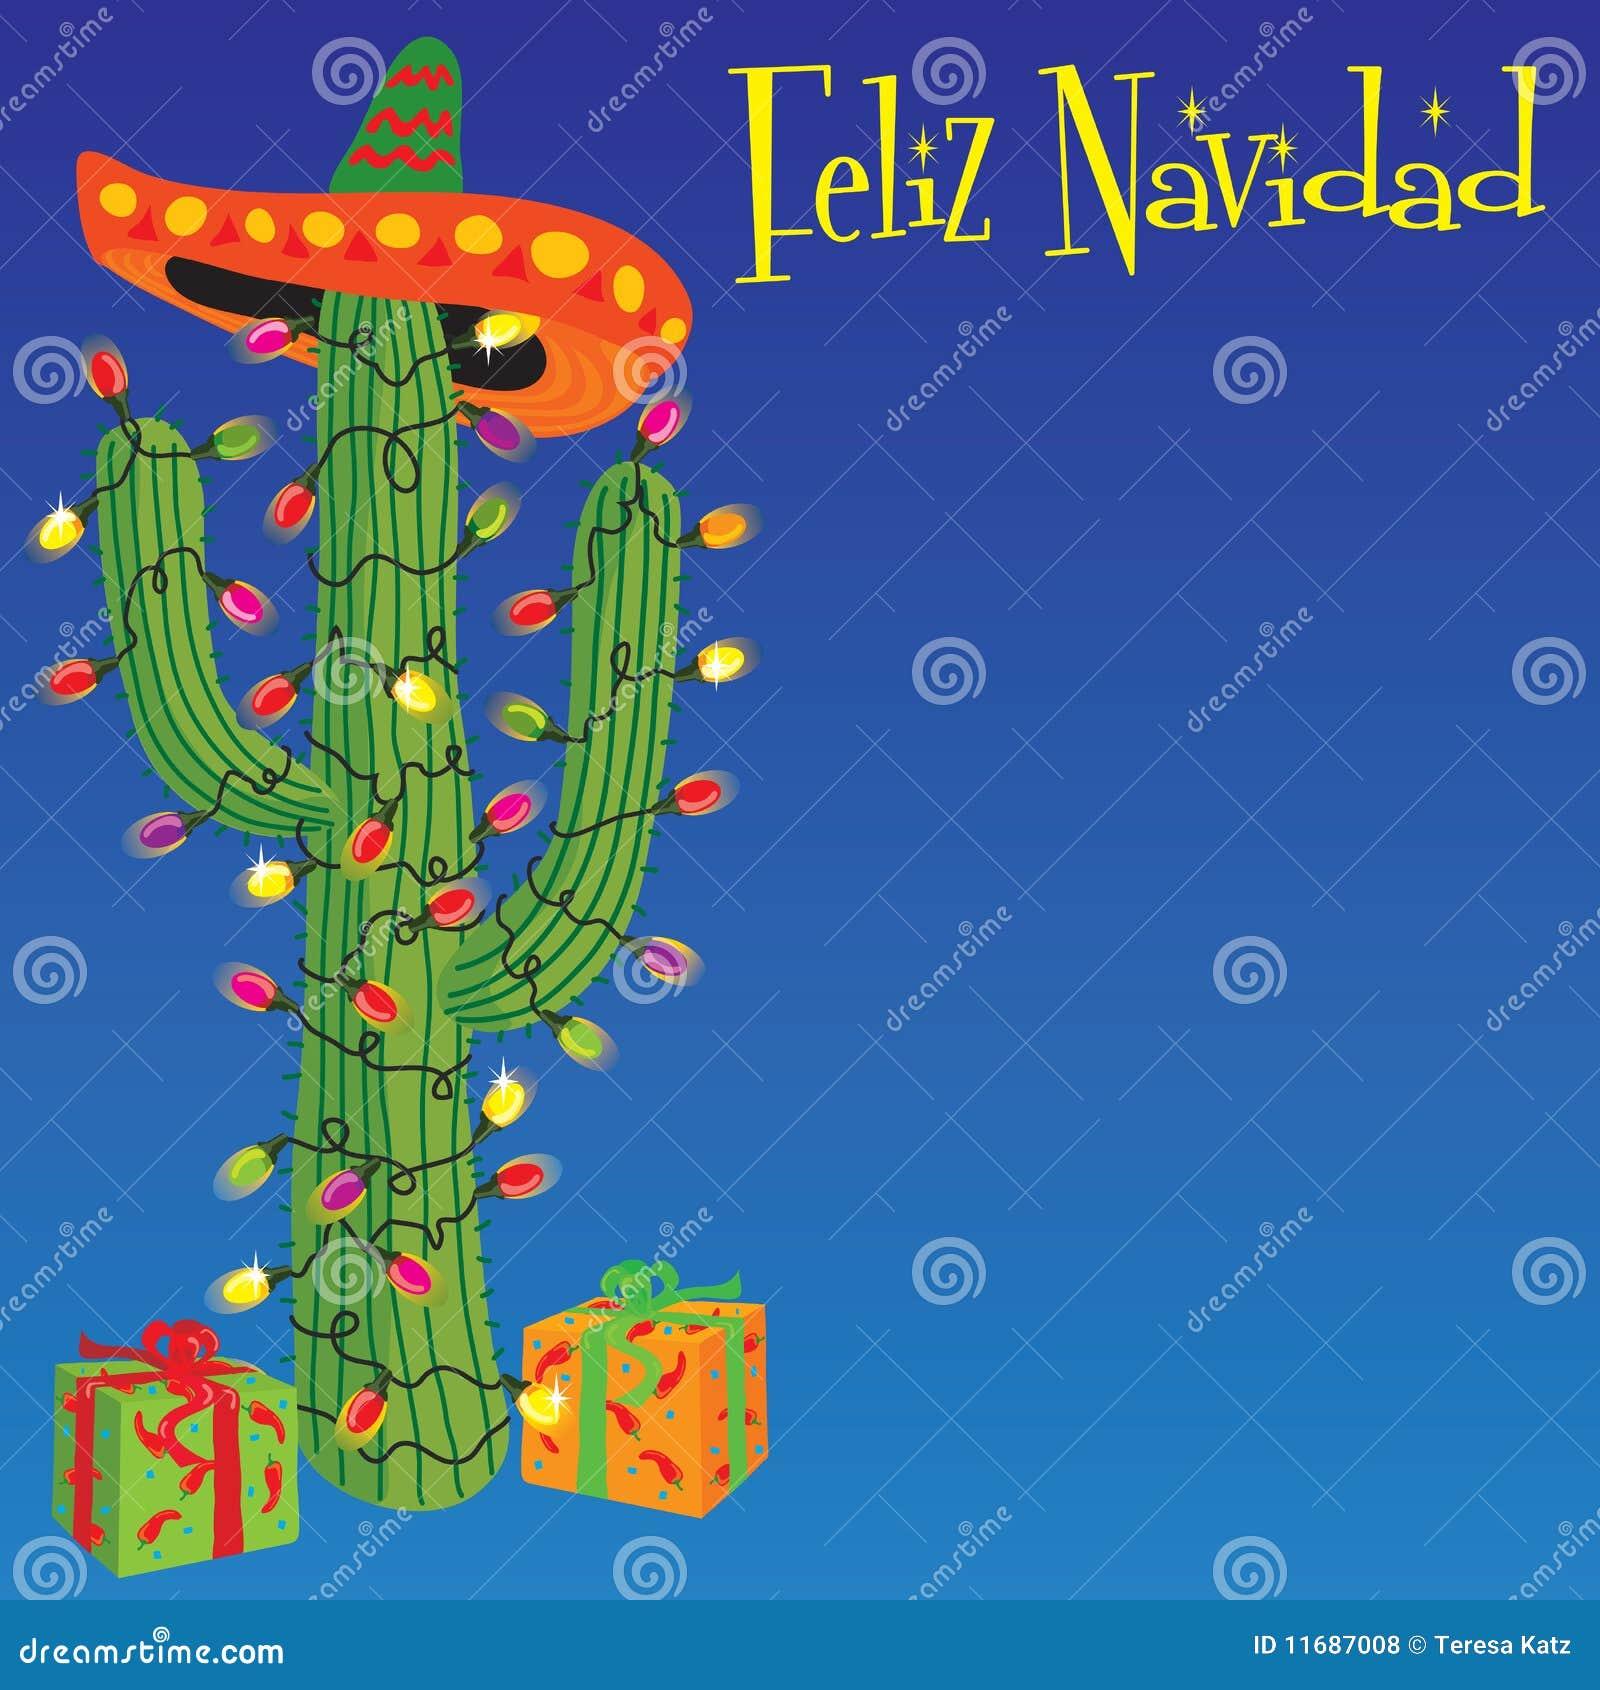 Mexican Fiesta Party Invitation Stock Vector Illustration Of Cinco